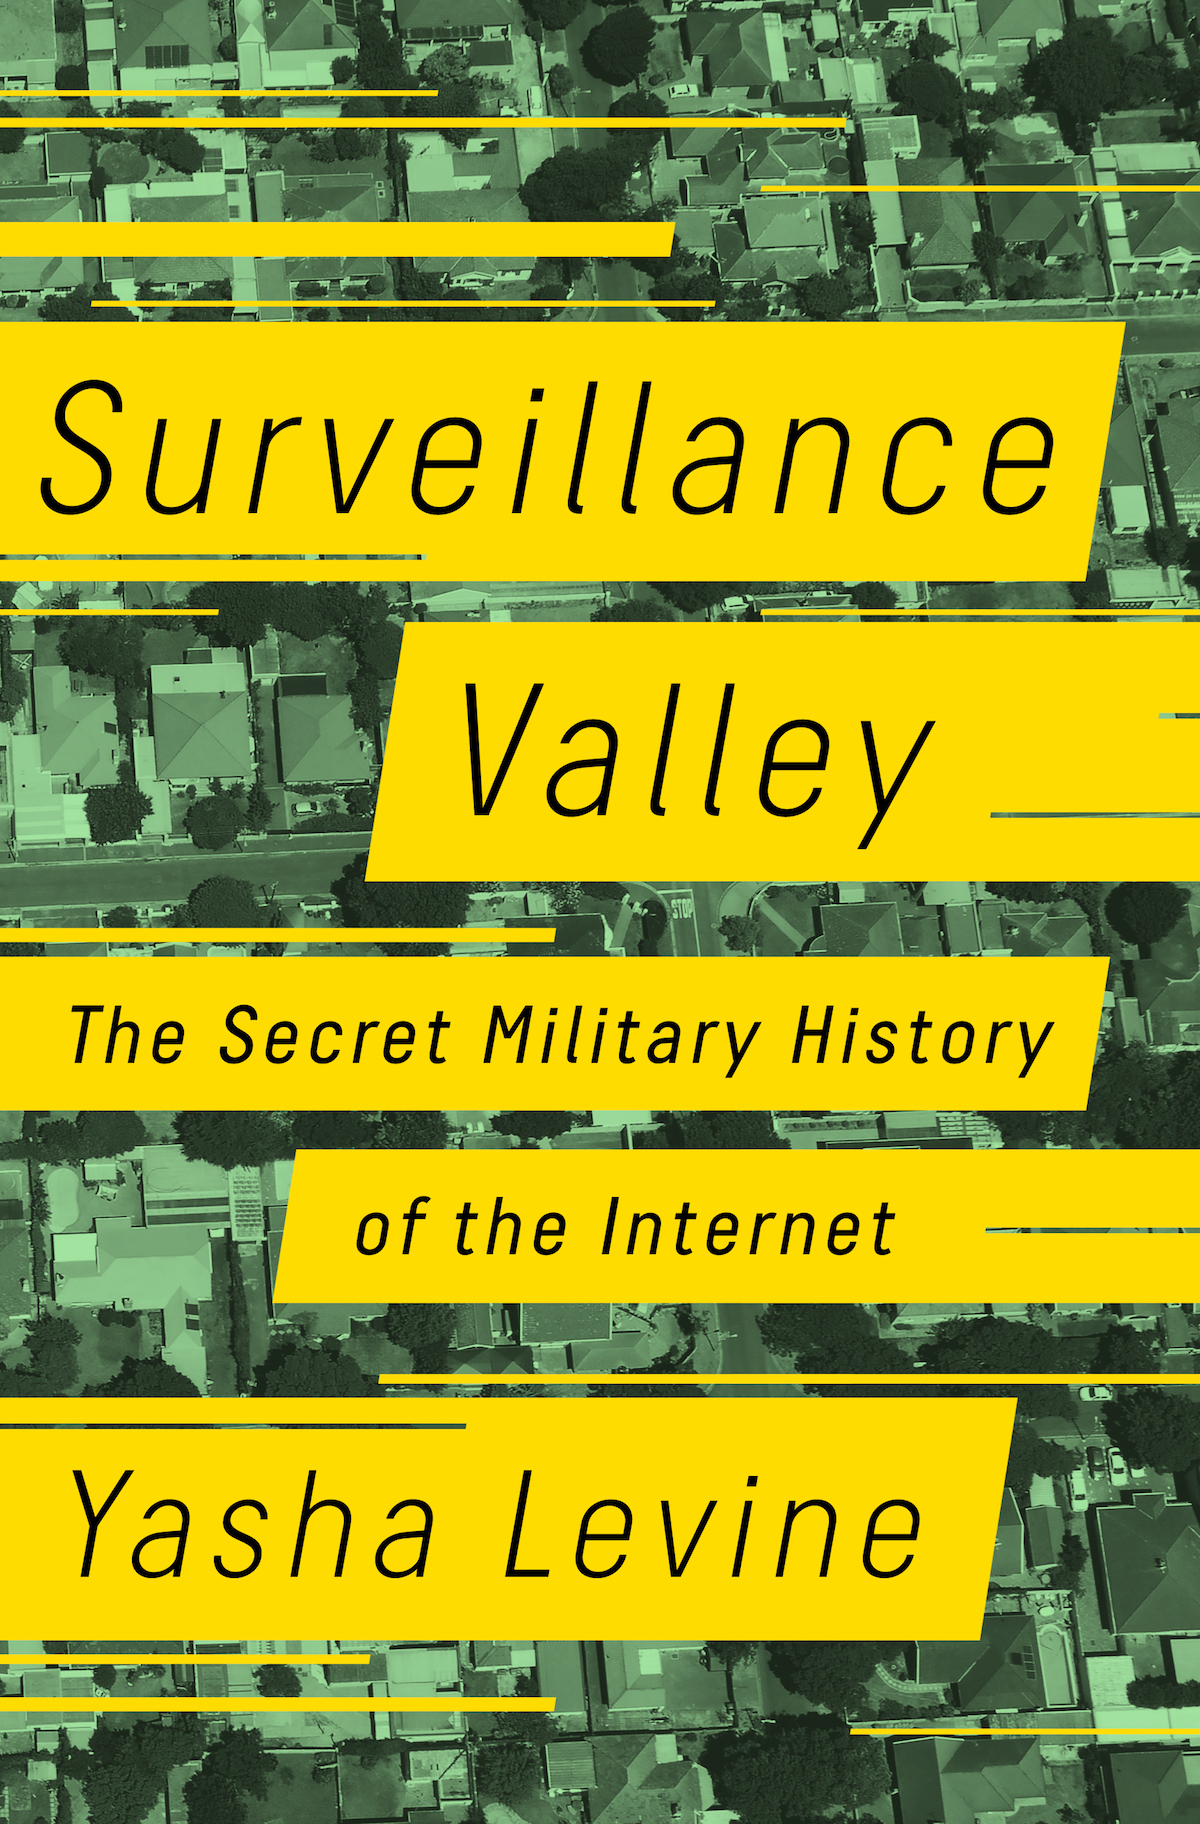 Buy Yasha Levine's Surveillance Valley: The Secret Military History of the Internet